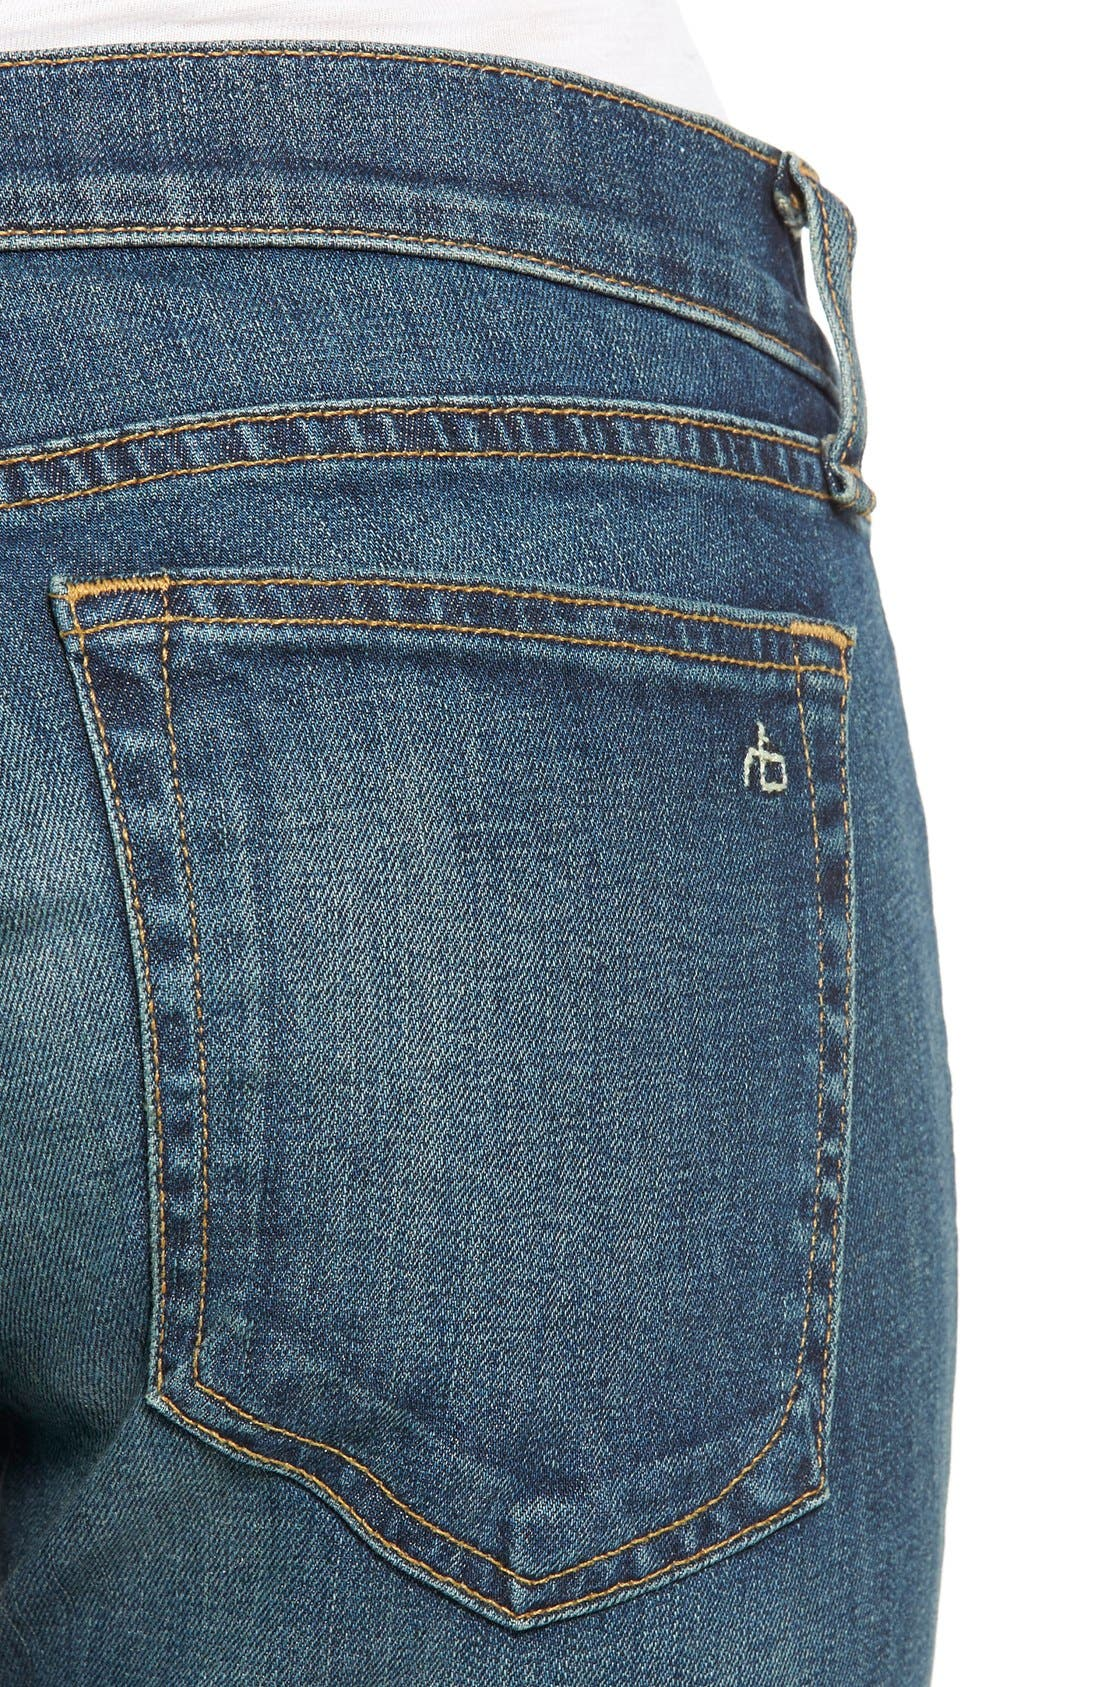 Alternate Image 4  - rag & bone/JEAN 'Tomboy' Boyfriend Skinny Jeans (Burnley)